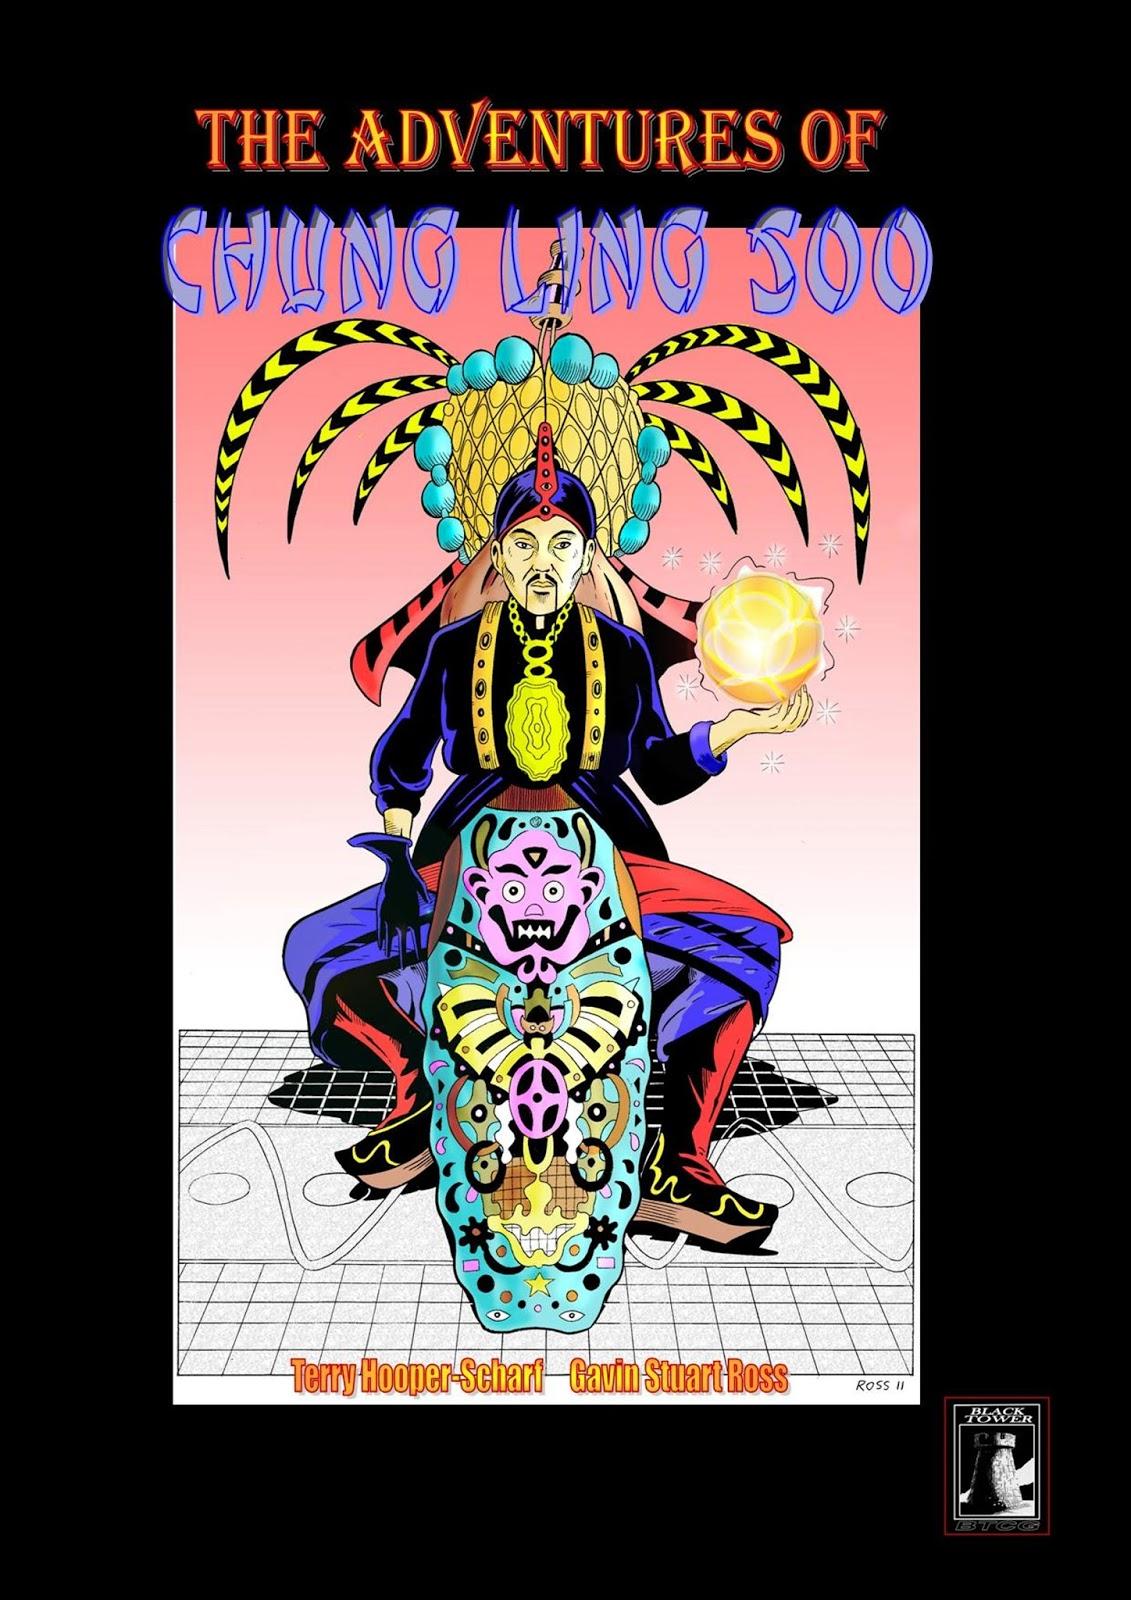 http://3.bp.blogspot.com/-oFMvOyJ_3EE/Uz18OVNLziI/AAAAAAAACqY/8bS1CVGxLxM/s1600/CHUNG+LING+SOO+FRONT+COVER.jpg